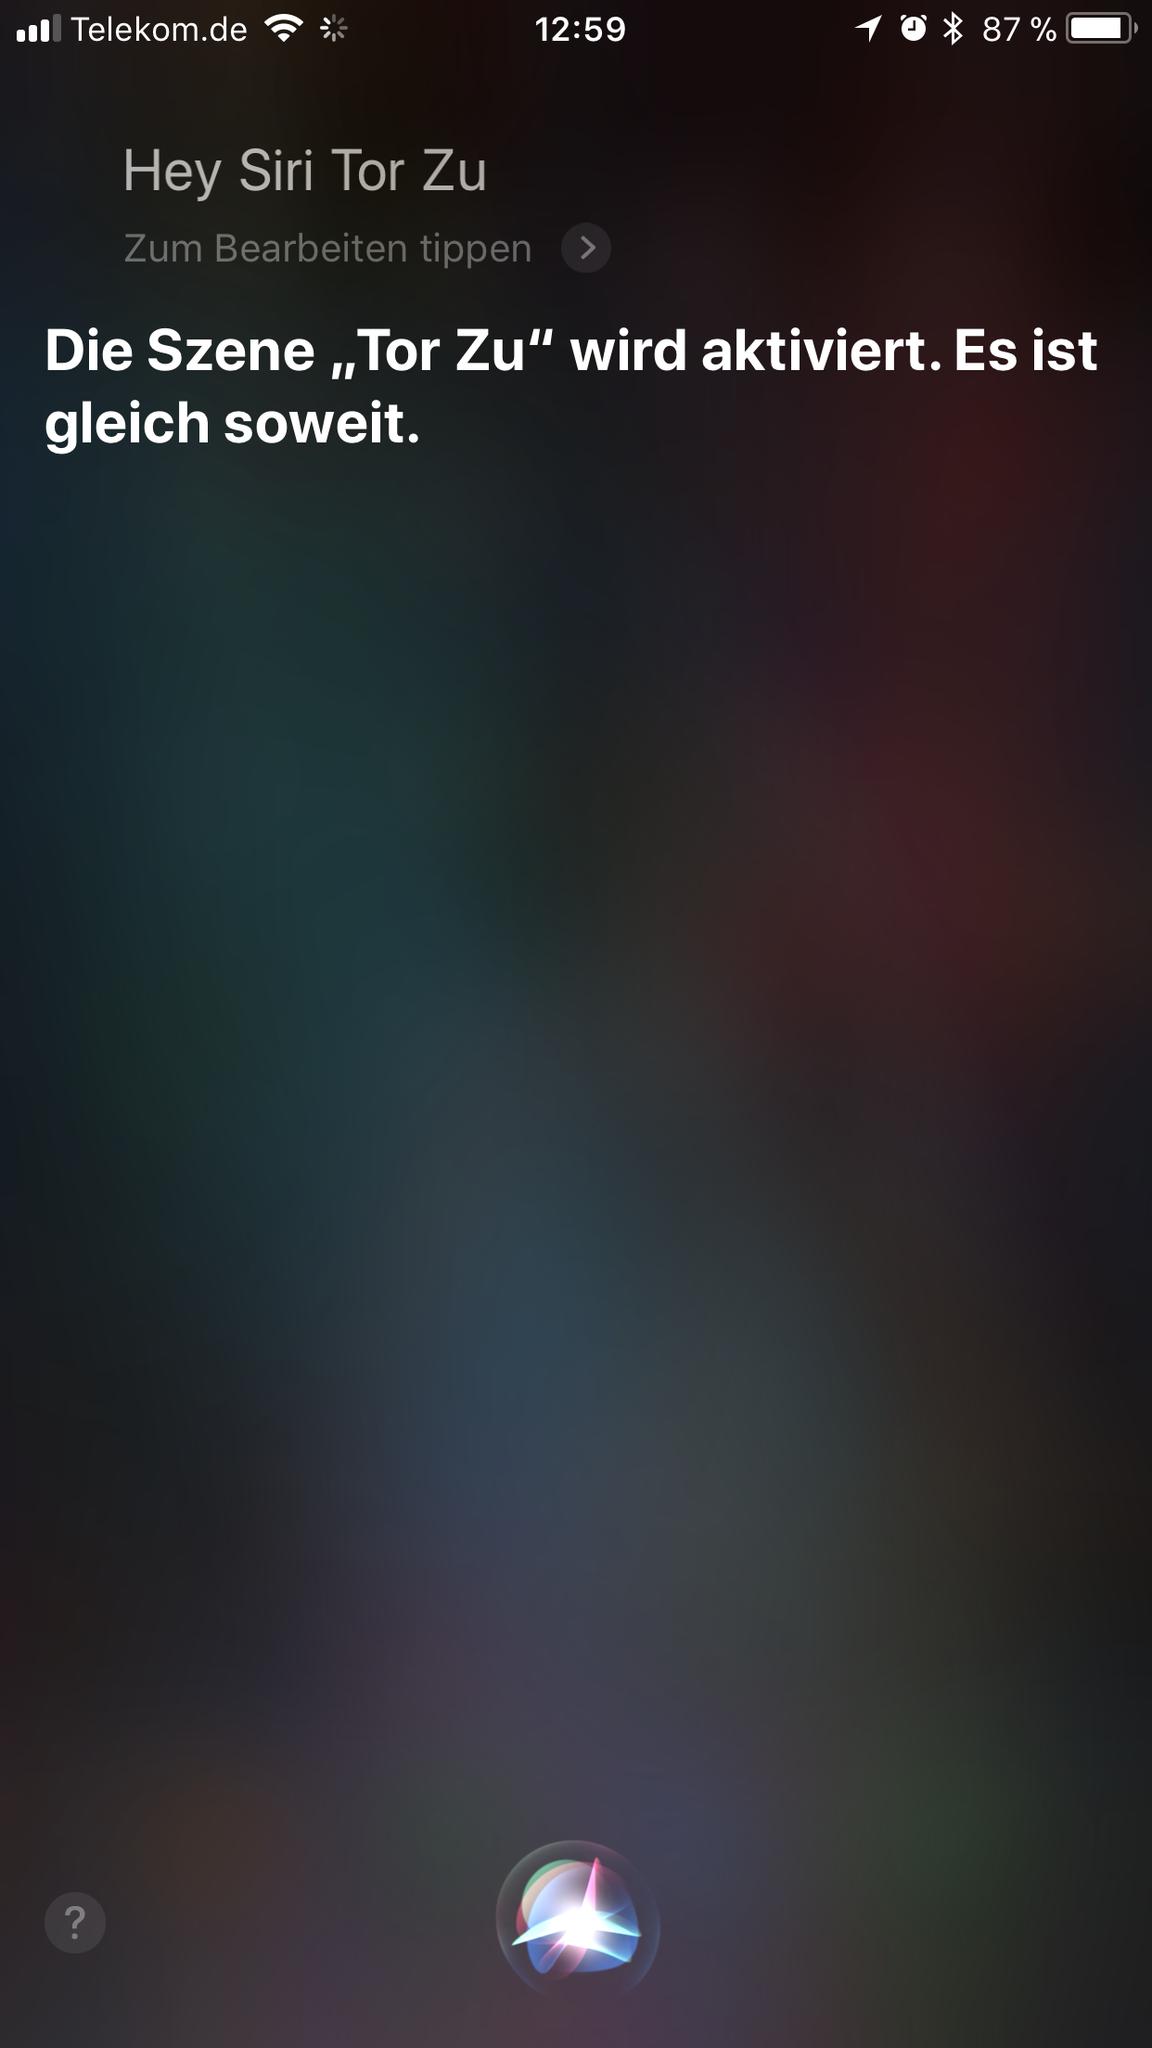 Hey Siri....